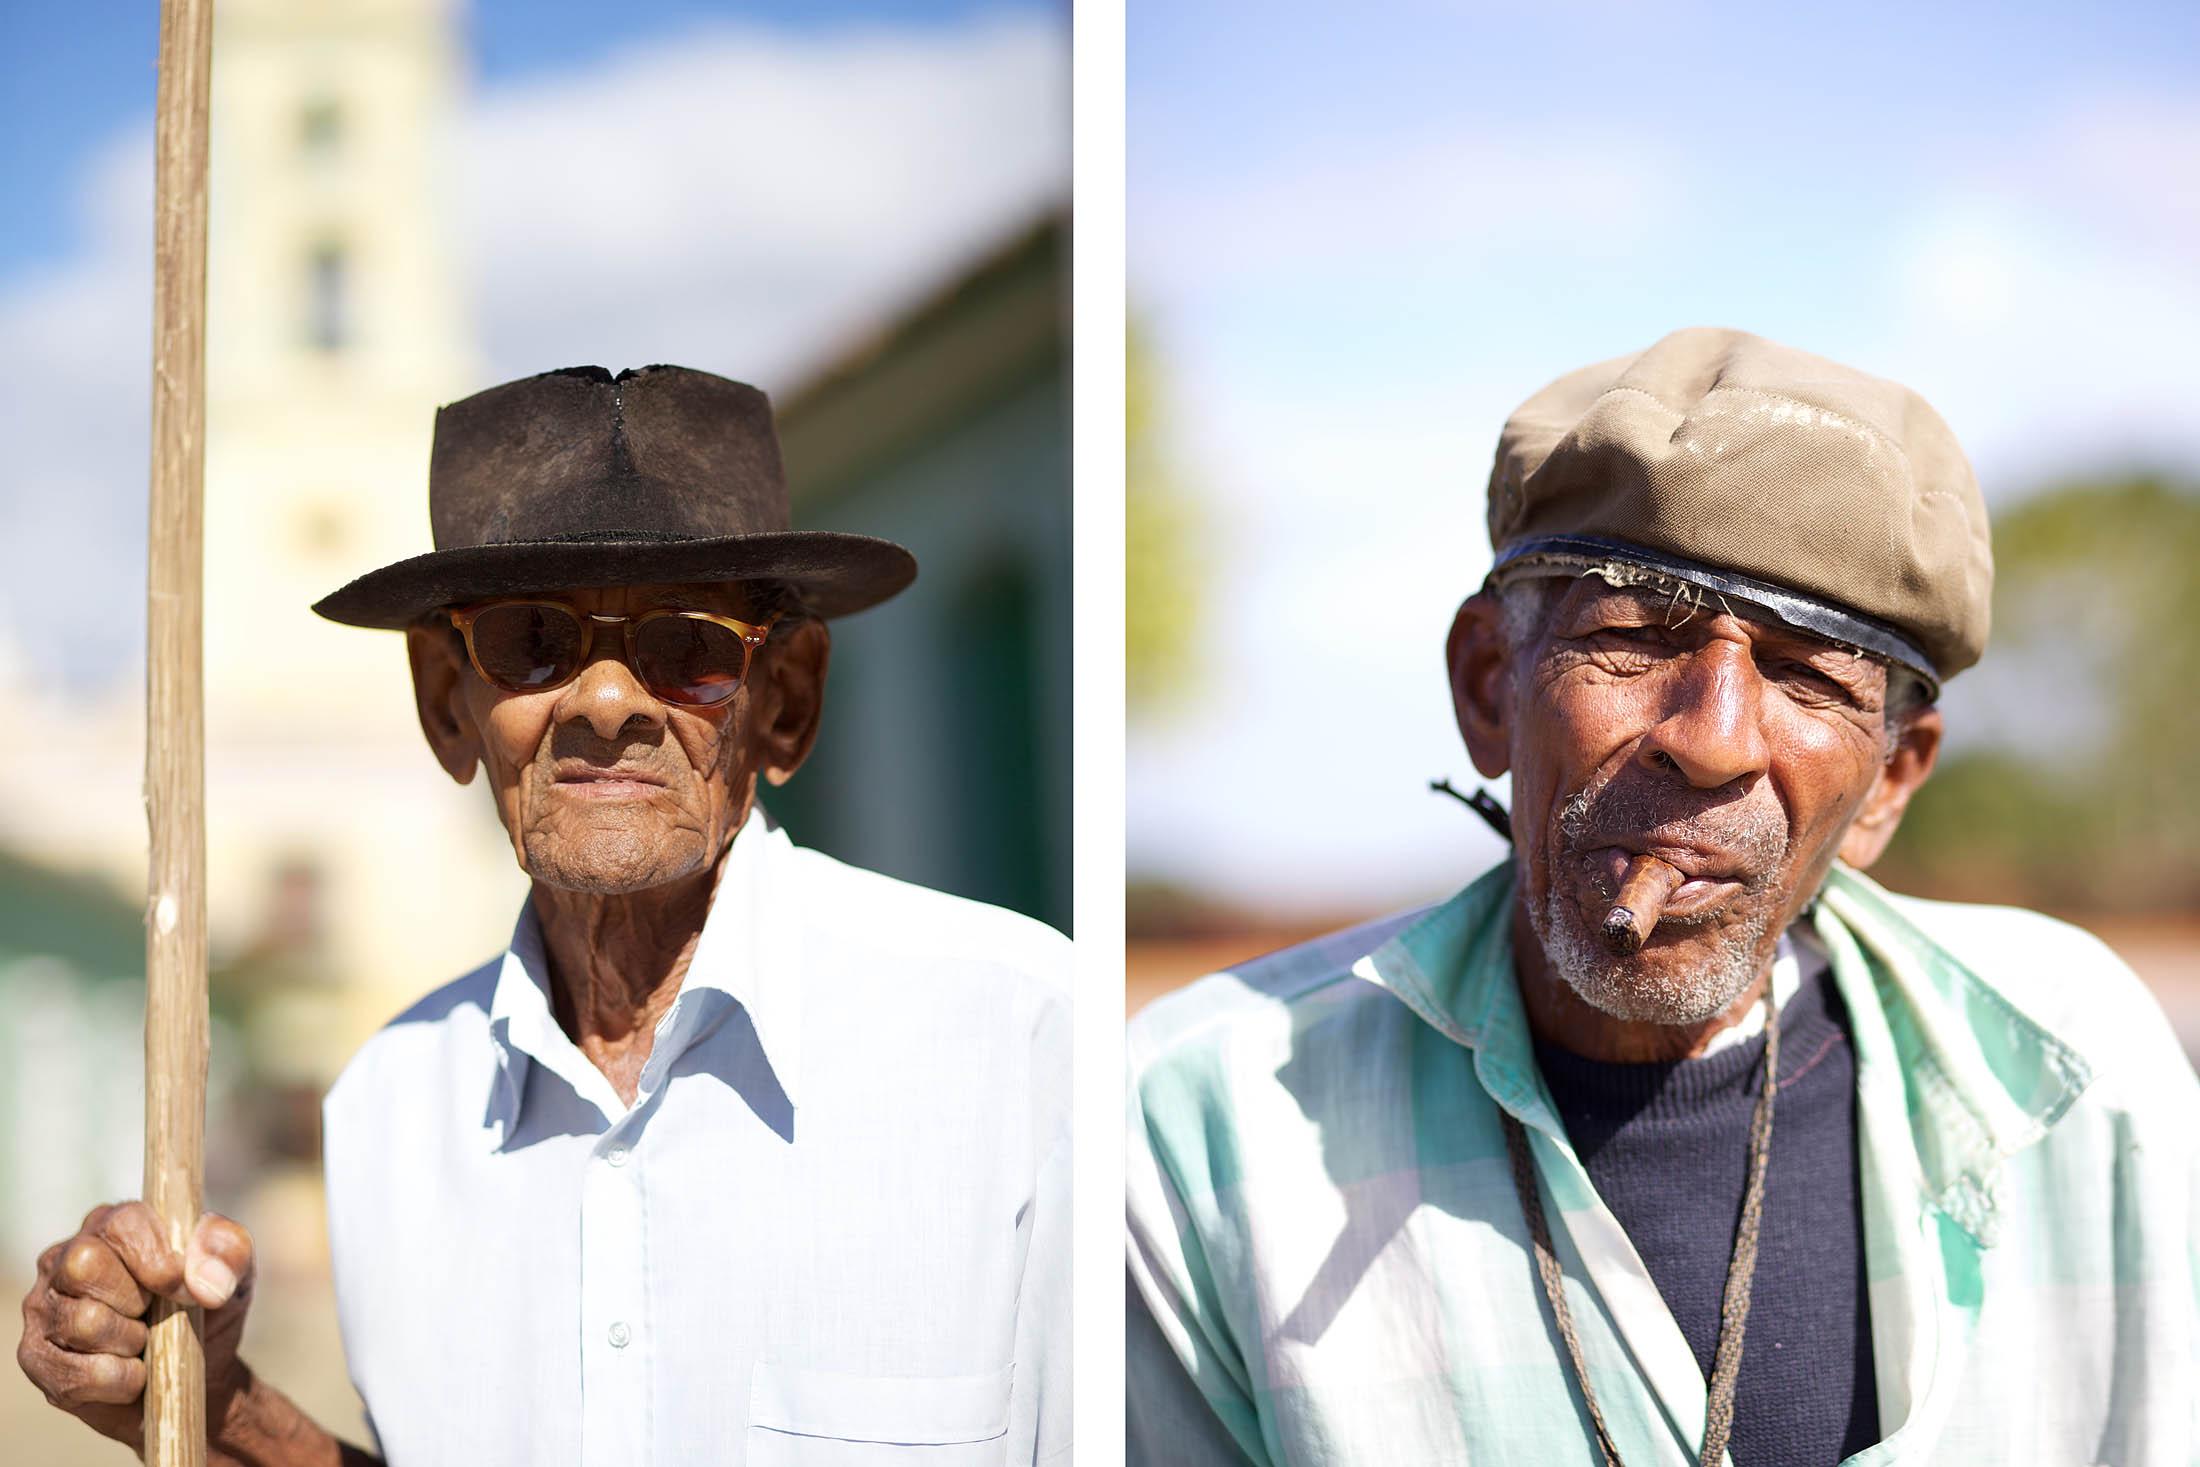 Cuban portraits